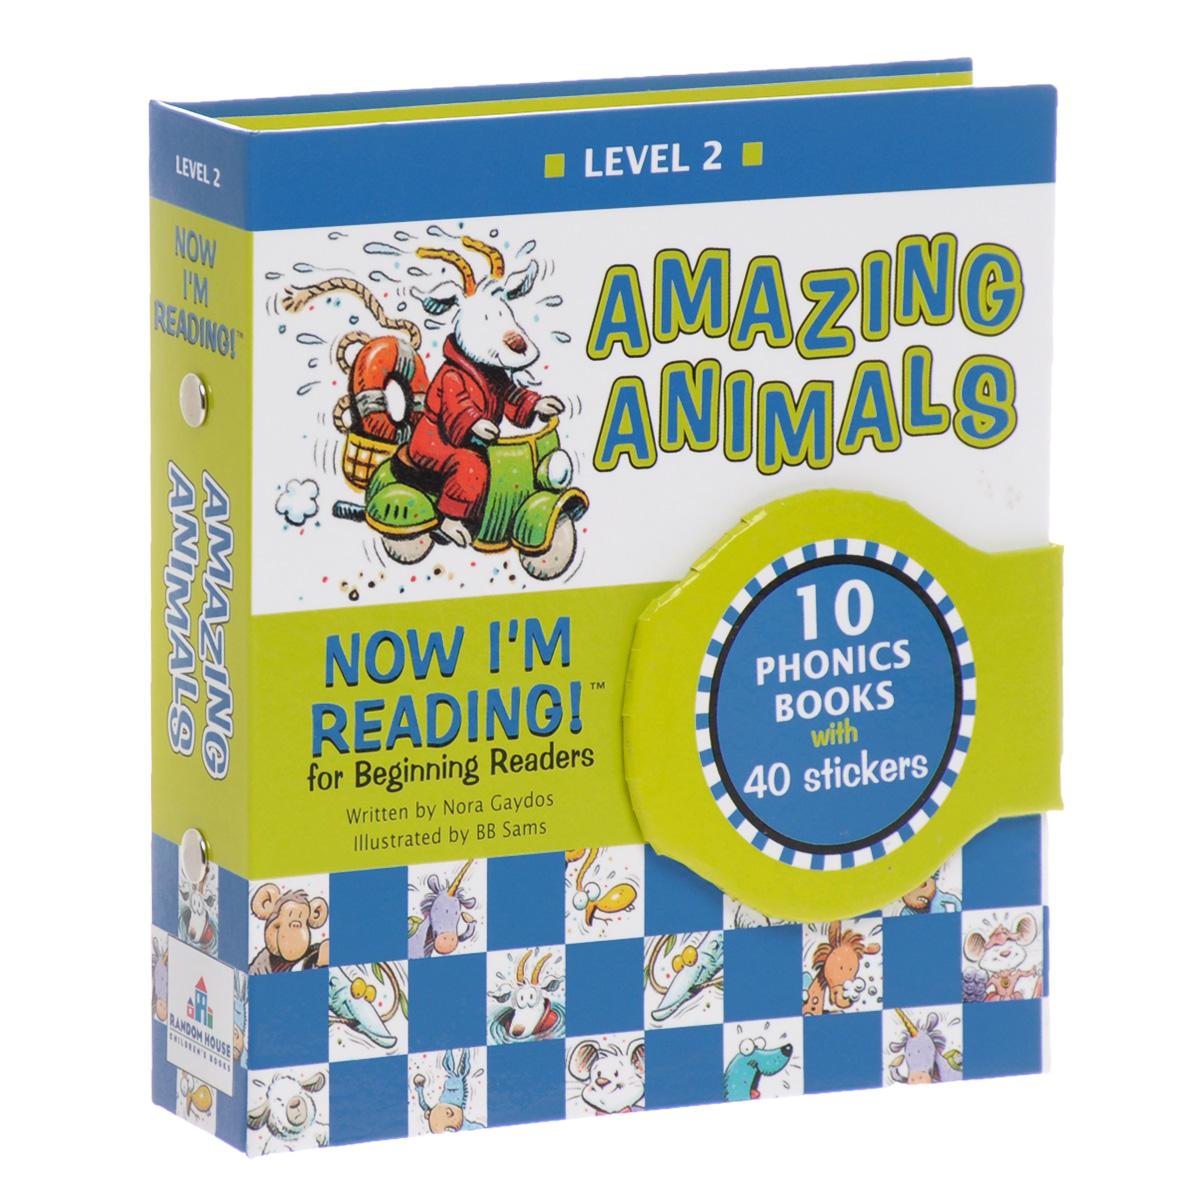 Now I'm Reading! Level 2: Amazing Animals (комплект из 10 книг + наклейки)